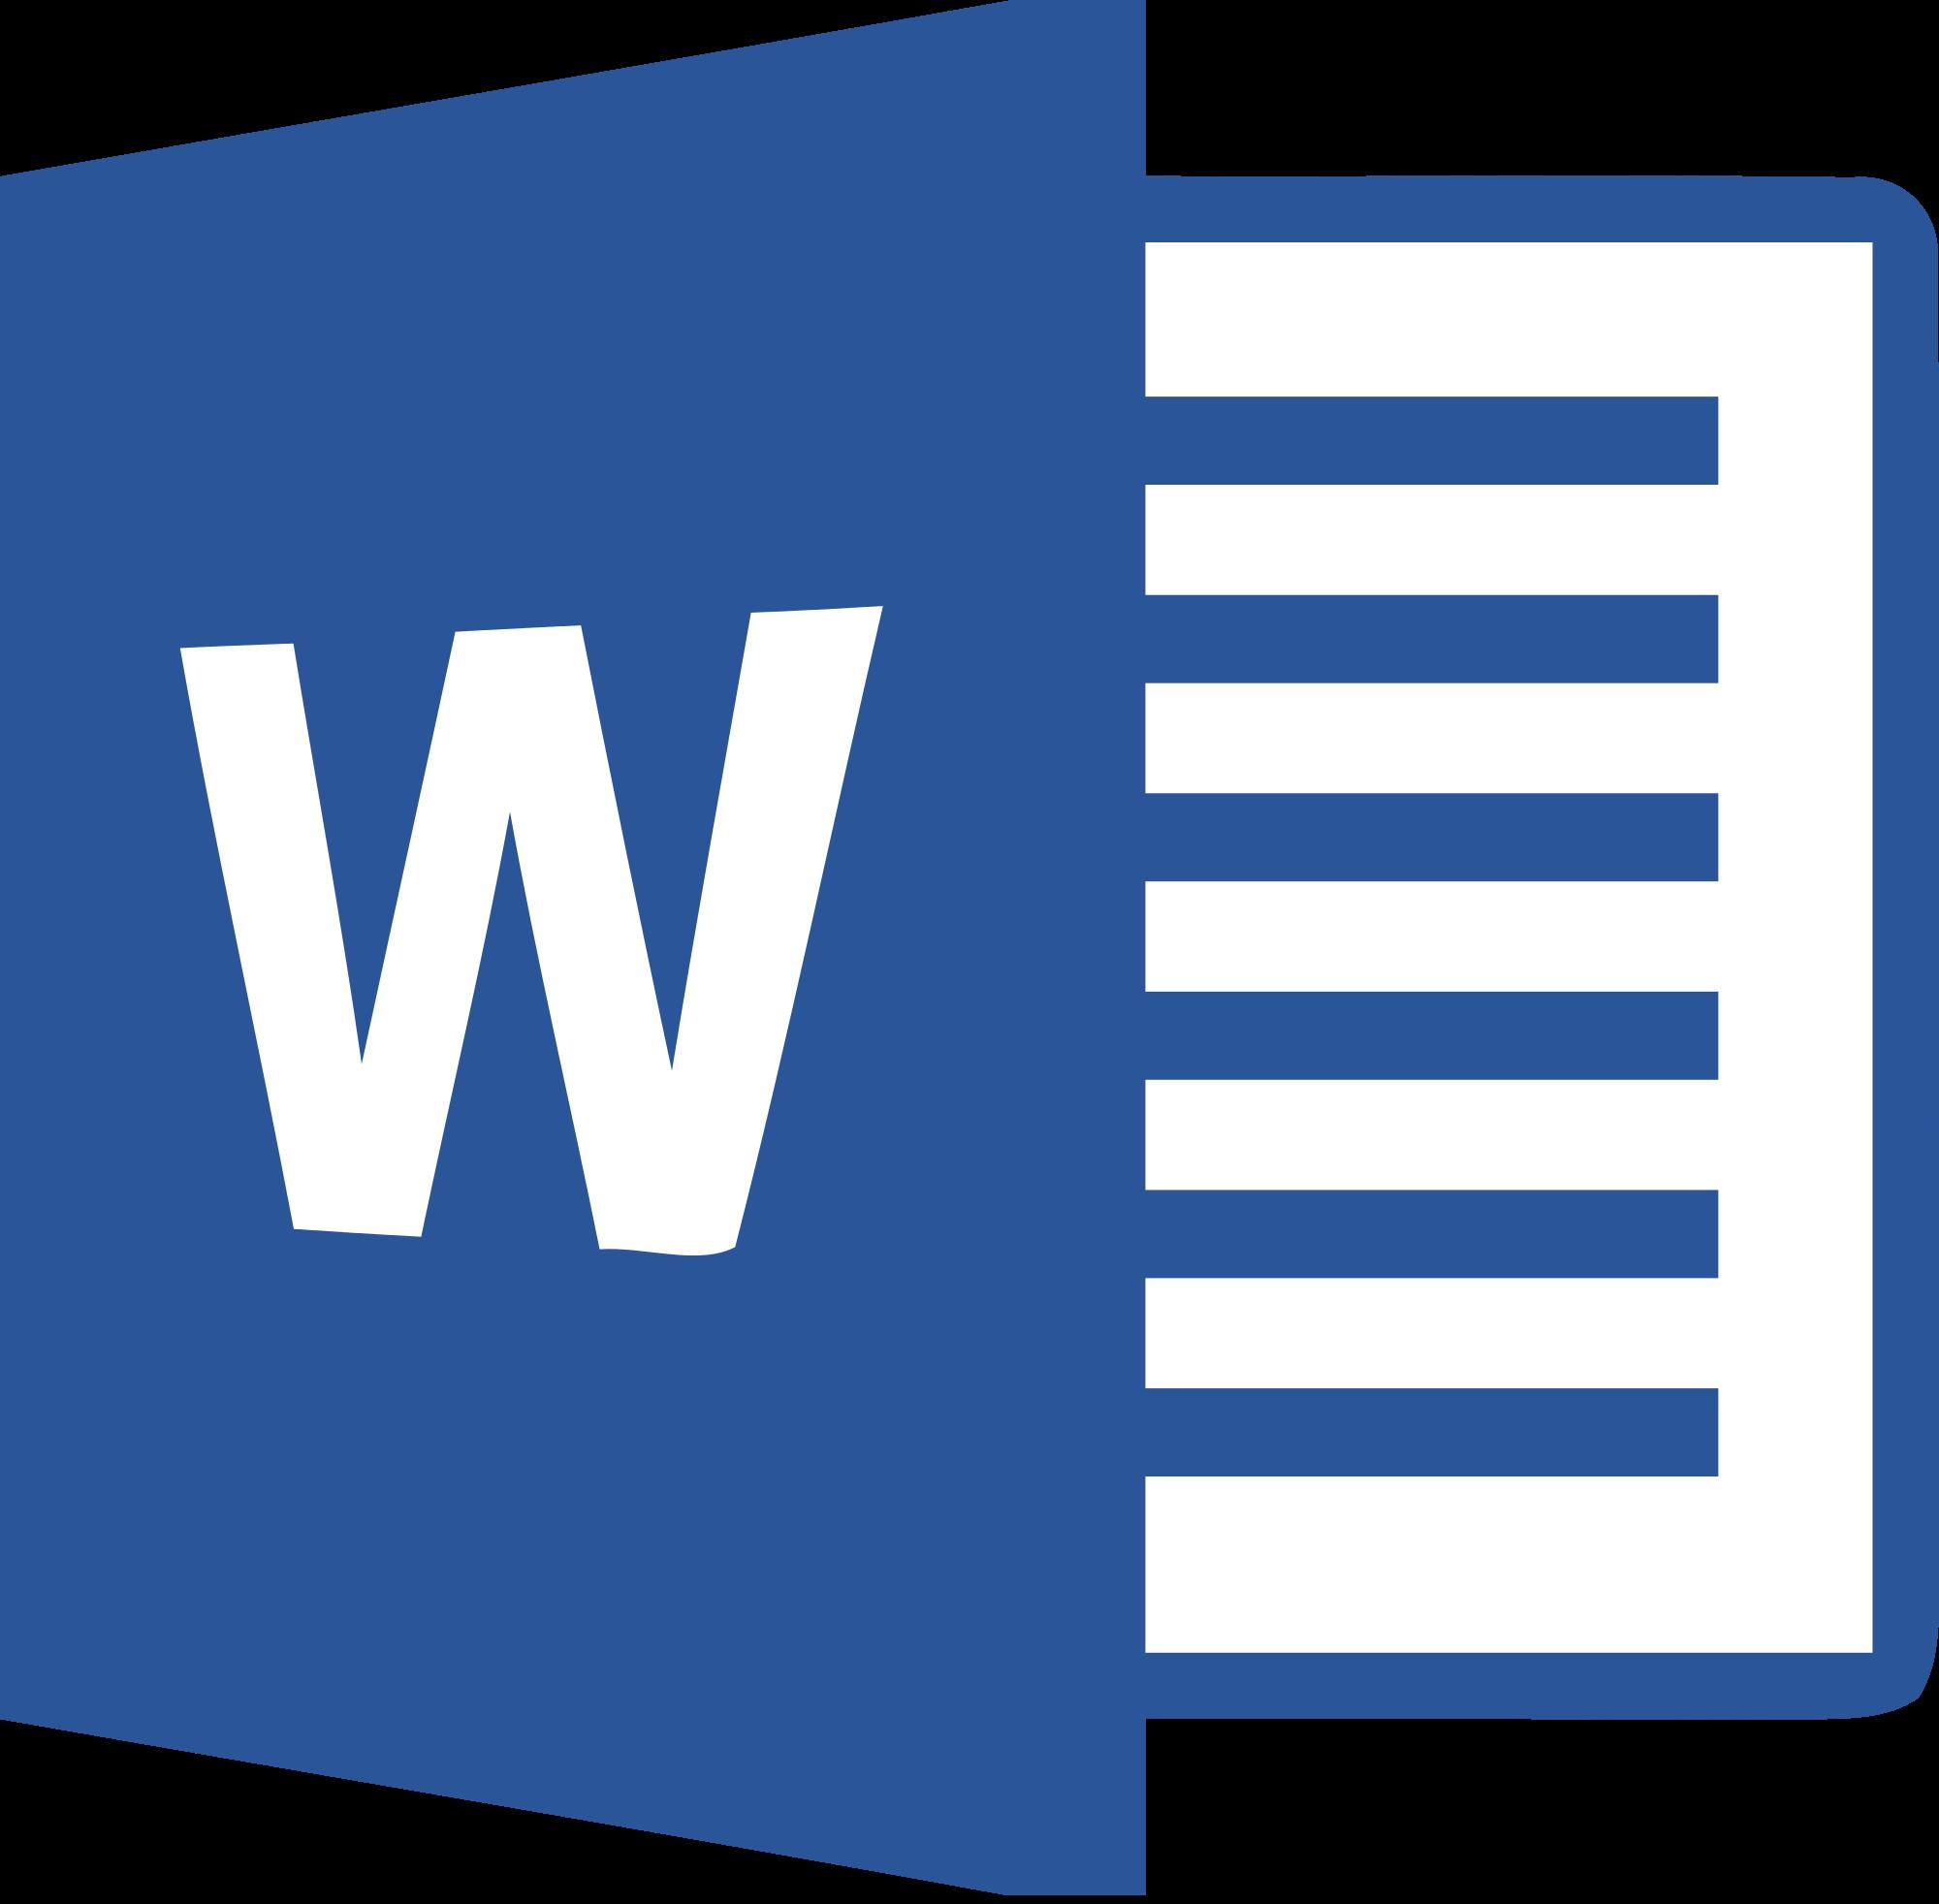 Microsoft_Word_2013_logo.svg